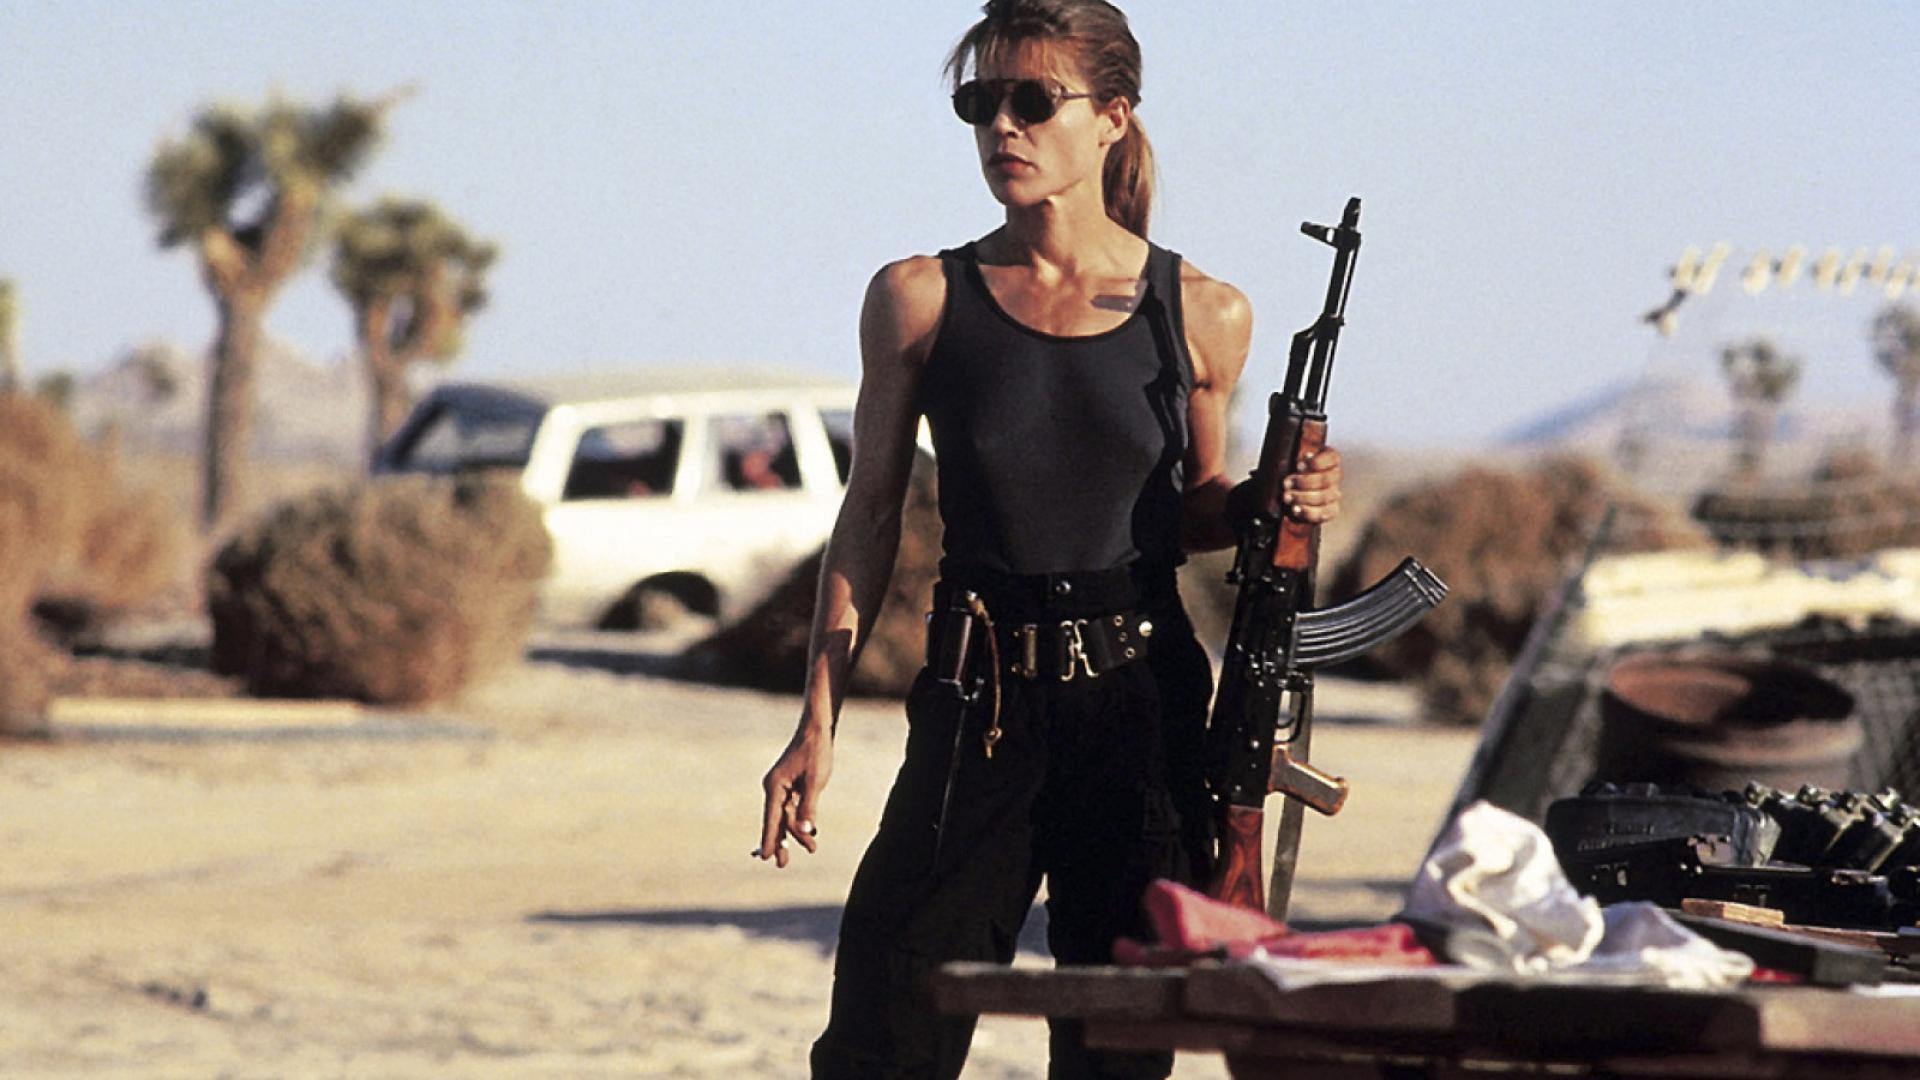 James Cameron Movie Stills - Terminator 2 Judgment Day